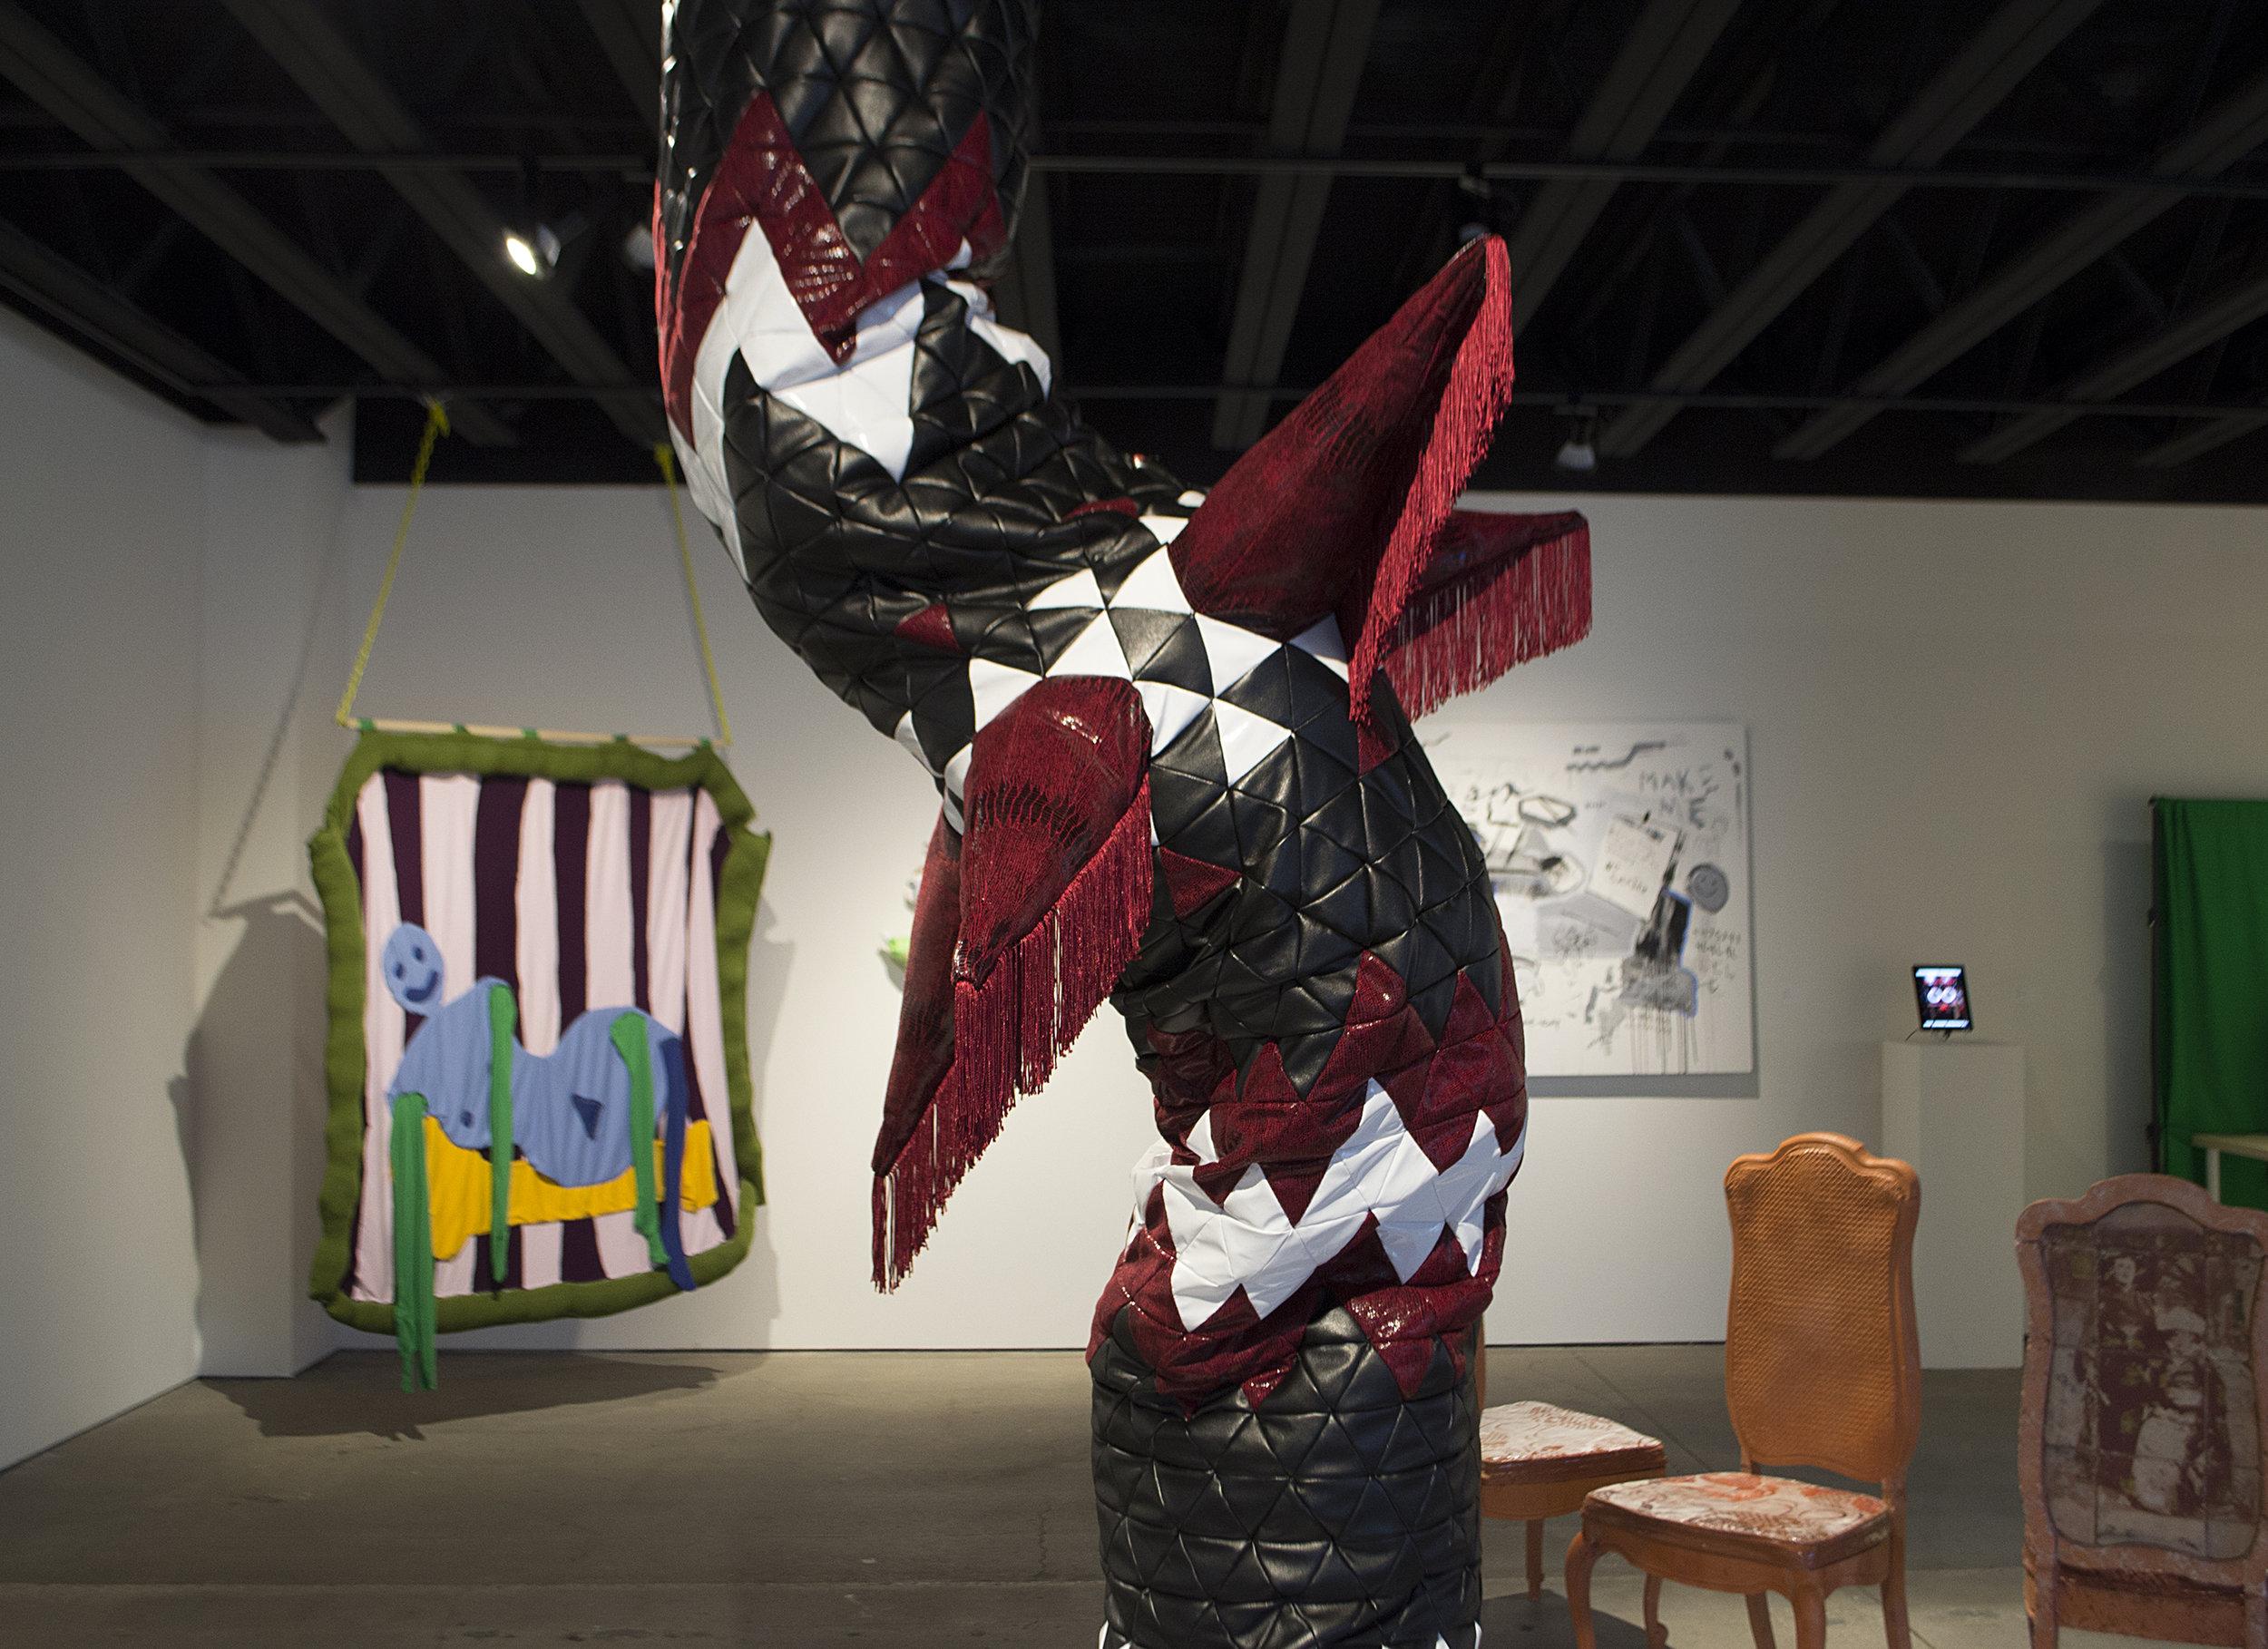 2015 Annual BFA Exhibition , H&R Block Artspace, Kansas City, Mo. 2015